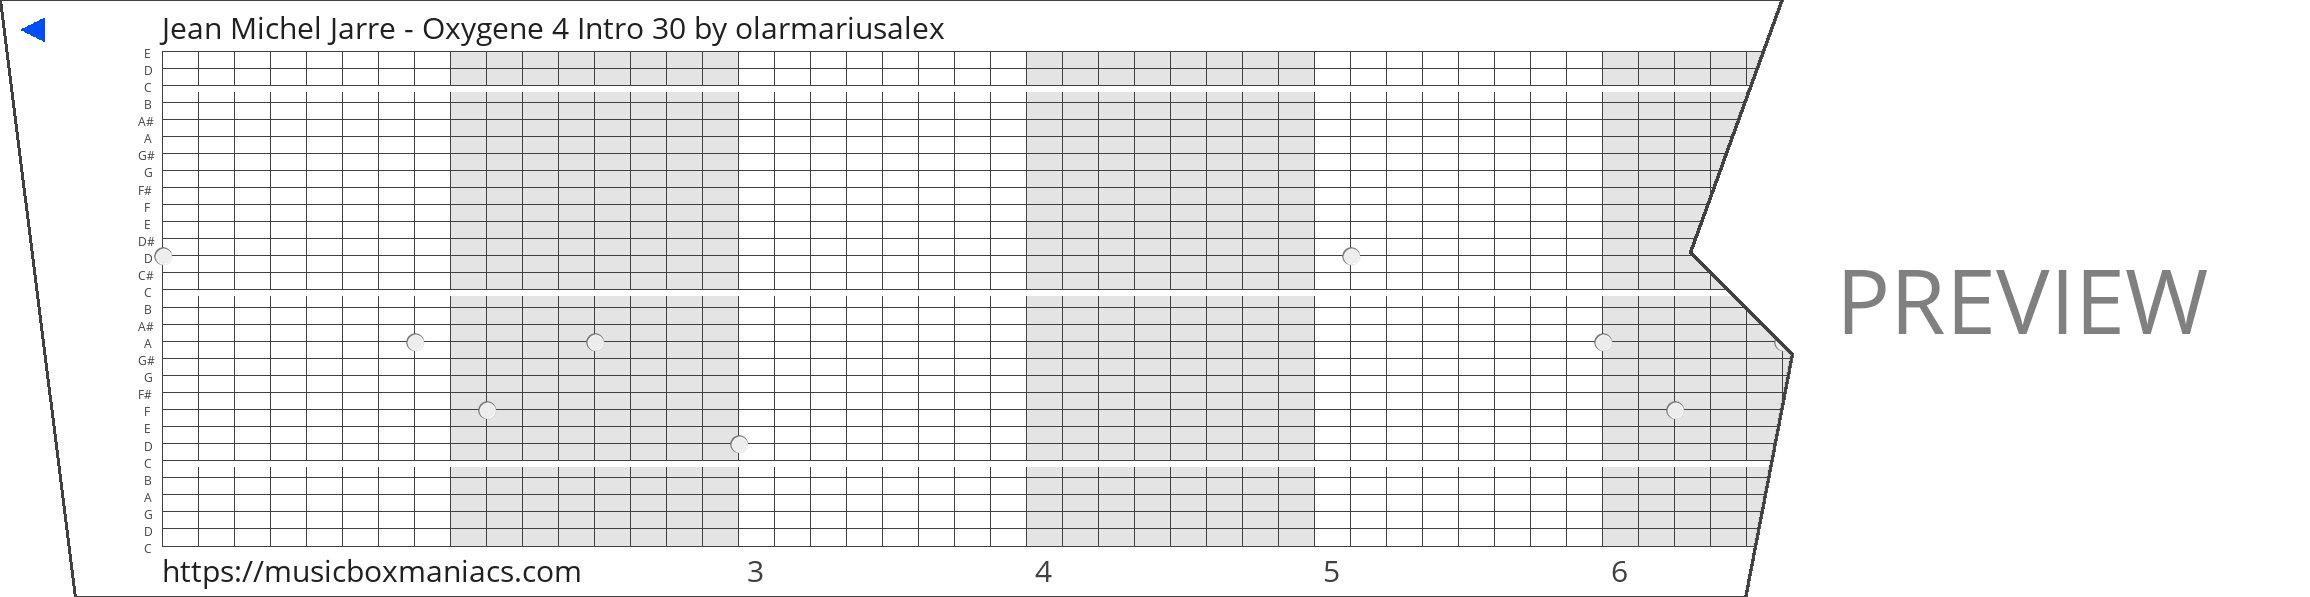 Jean Michel Jarre - Oxygene 4 Intro 30 30 note music box paper strip